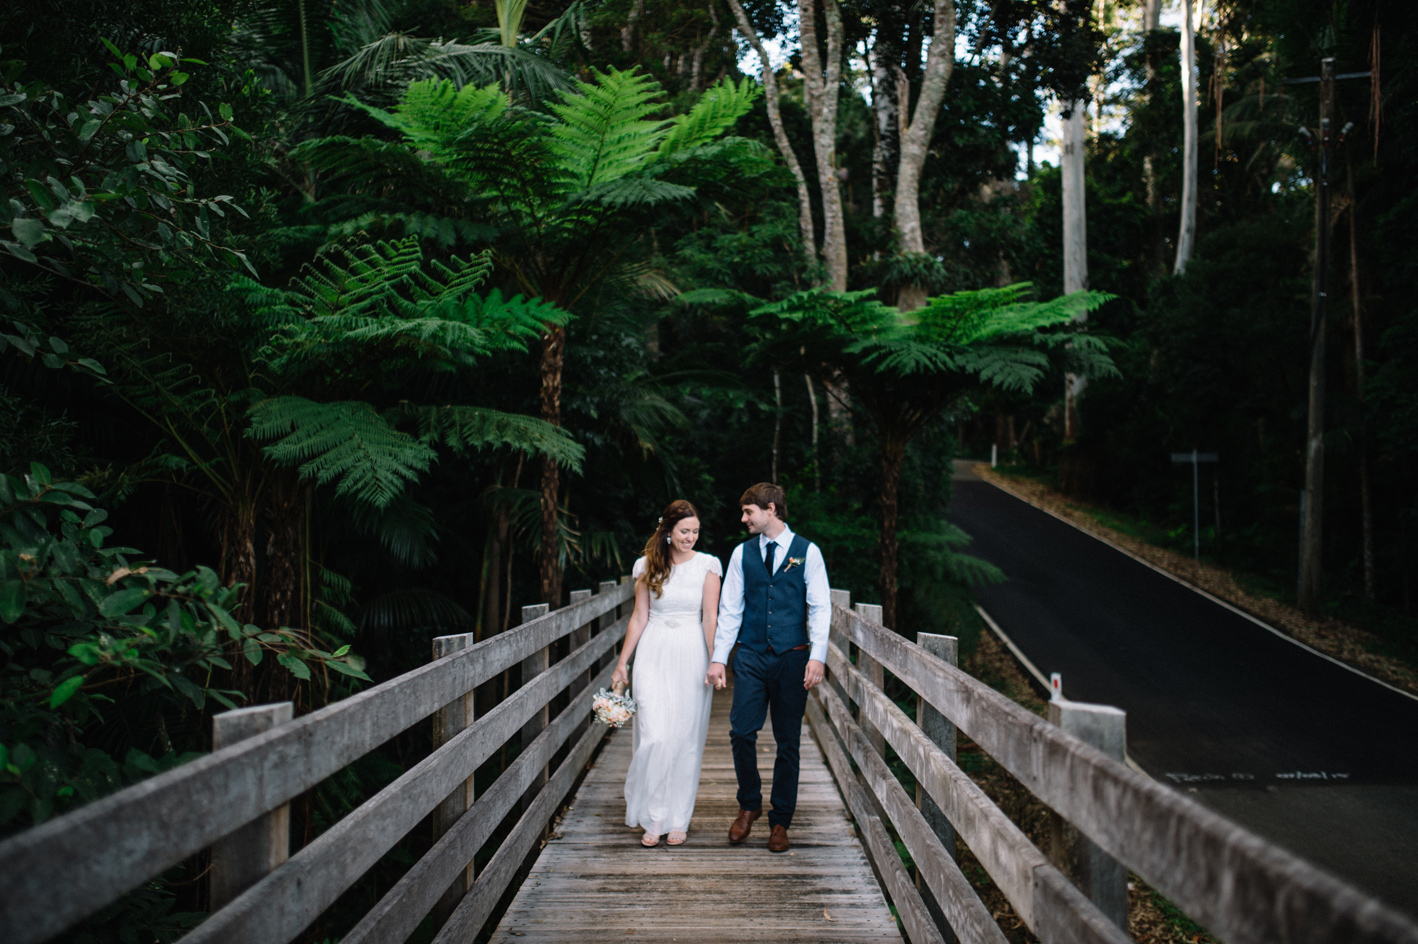 051-michelle-reagan-mount-tamborine-wedding-sophie-baker-photography